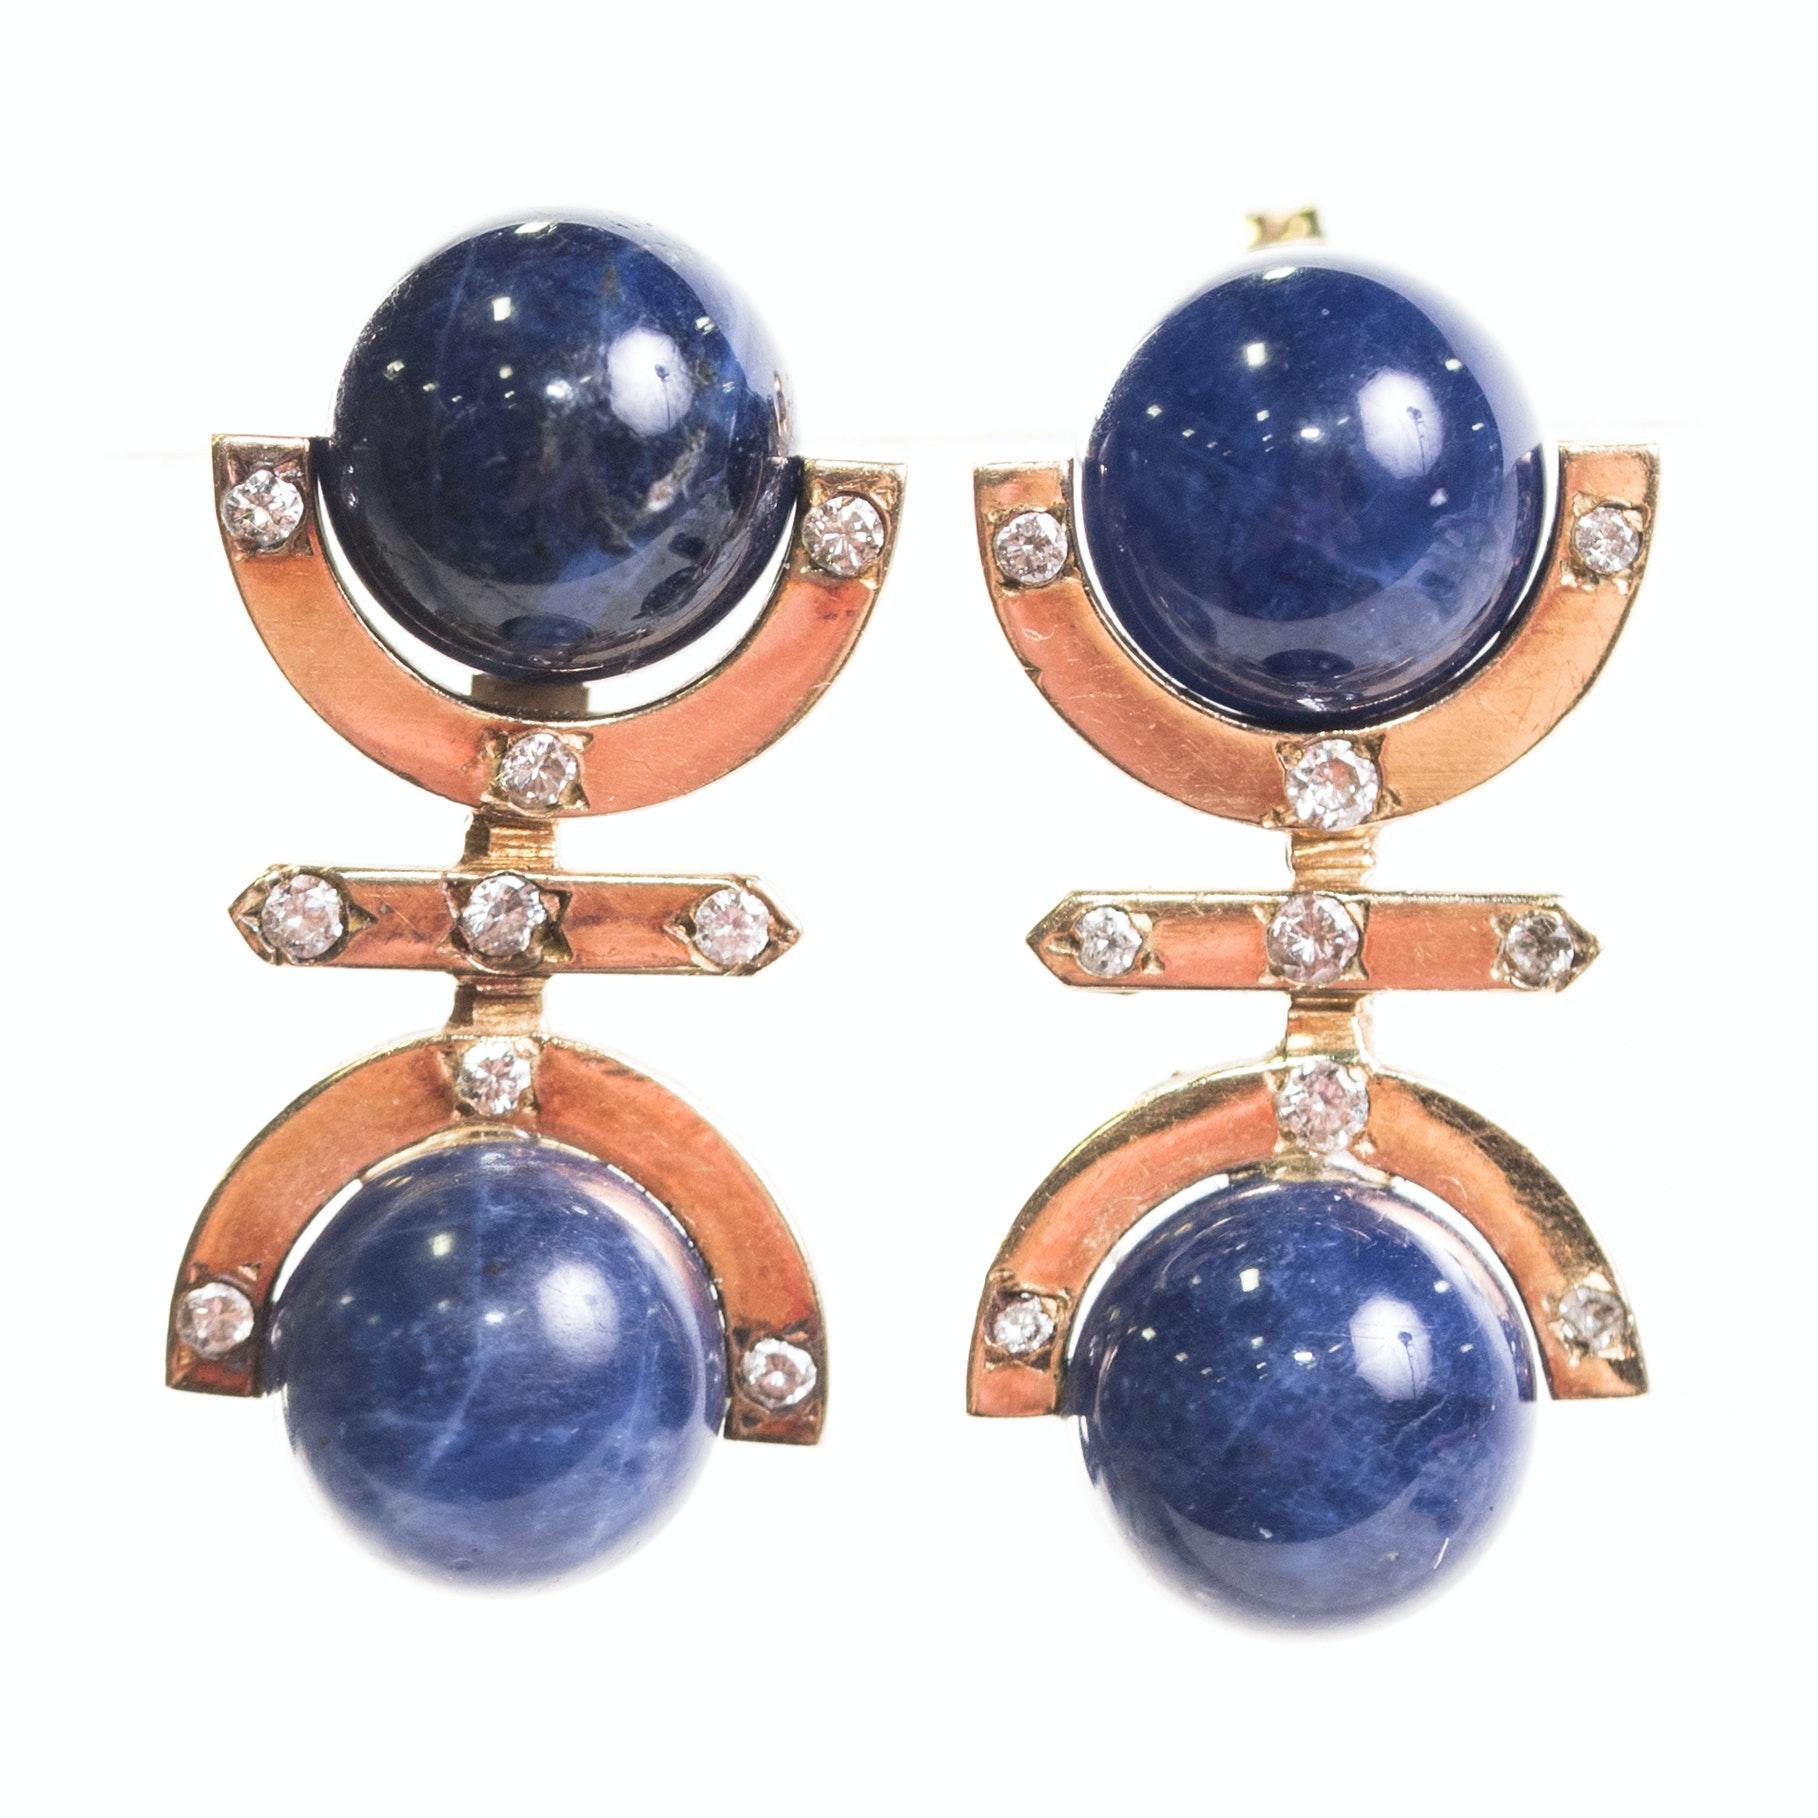 18K Yellow Gold, Lapis Lazuli, and Diamond Earrings